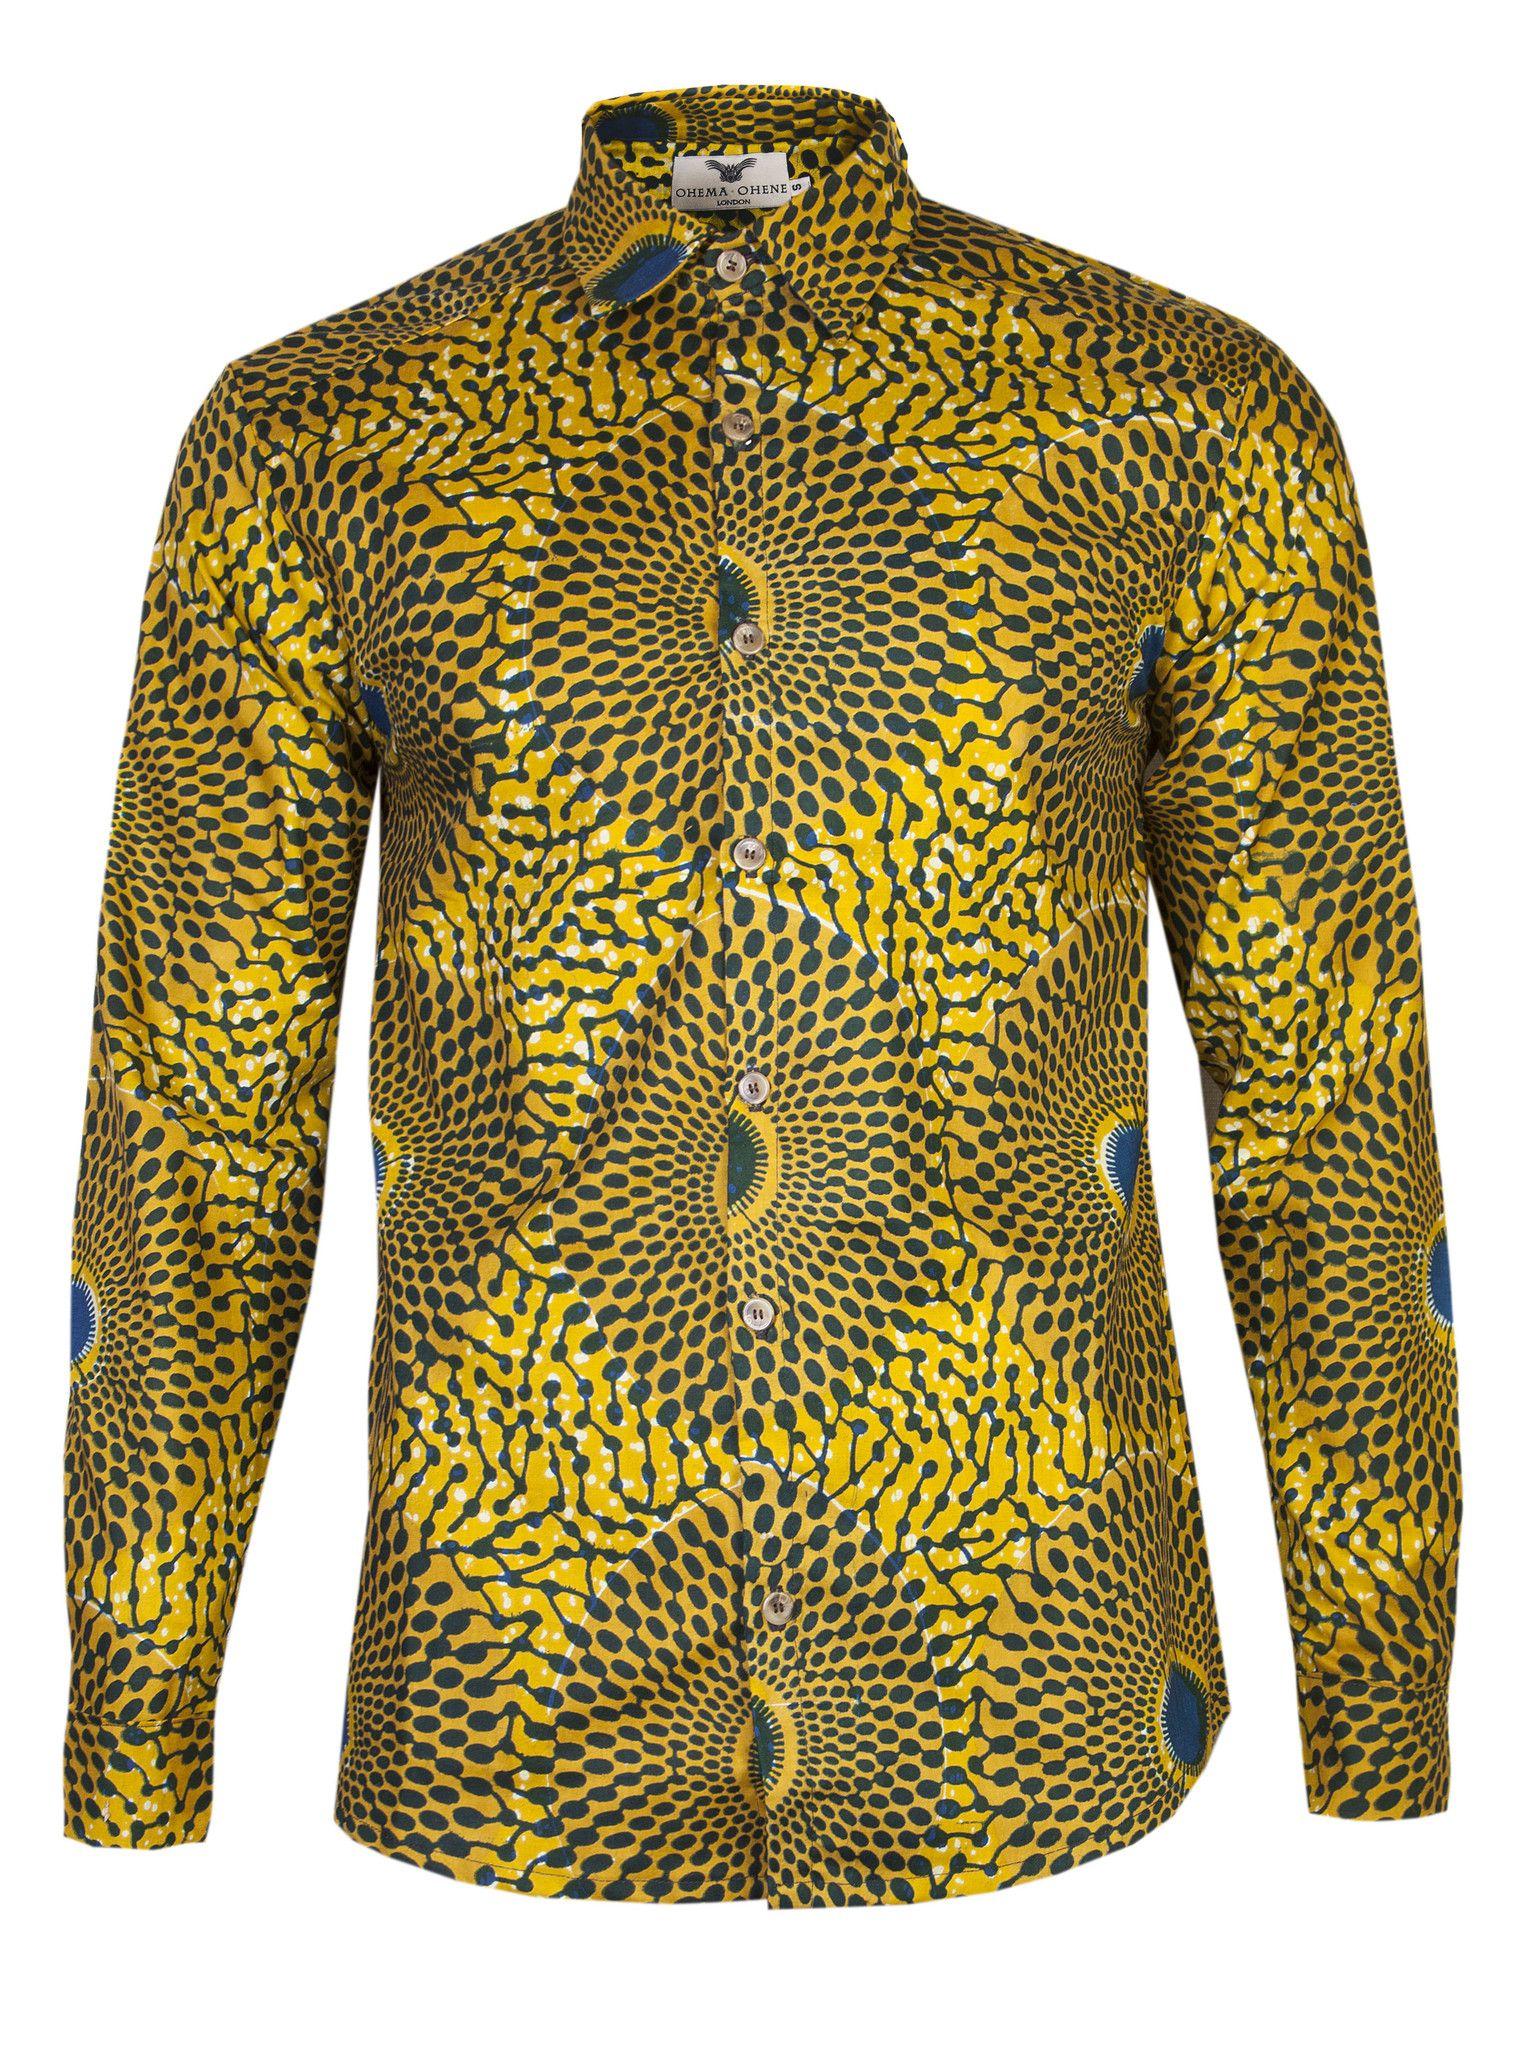 Long sleeve African print shirt Nsubra - OHEMA OHENE AFRICAN INSPIRED  FASHION - 1 bac9a456b